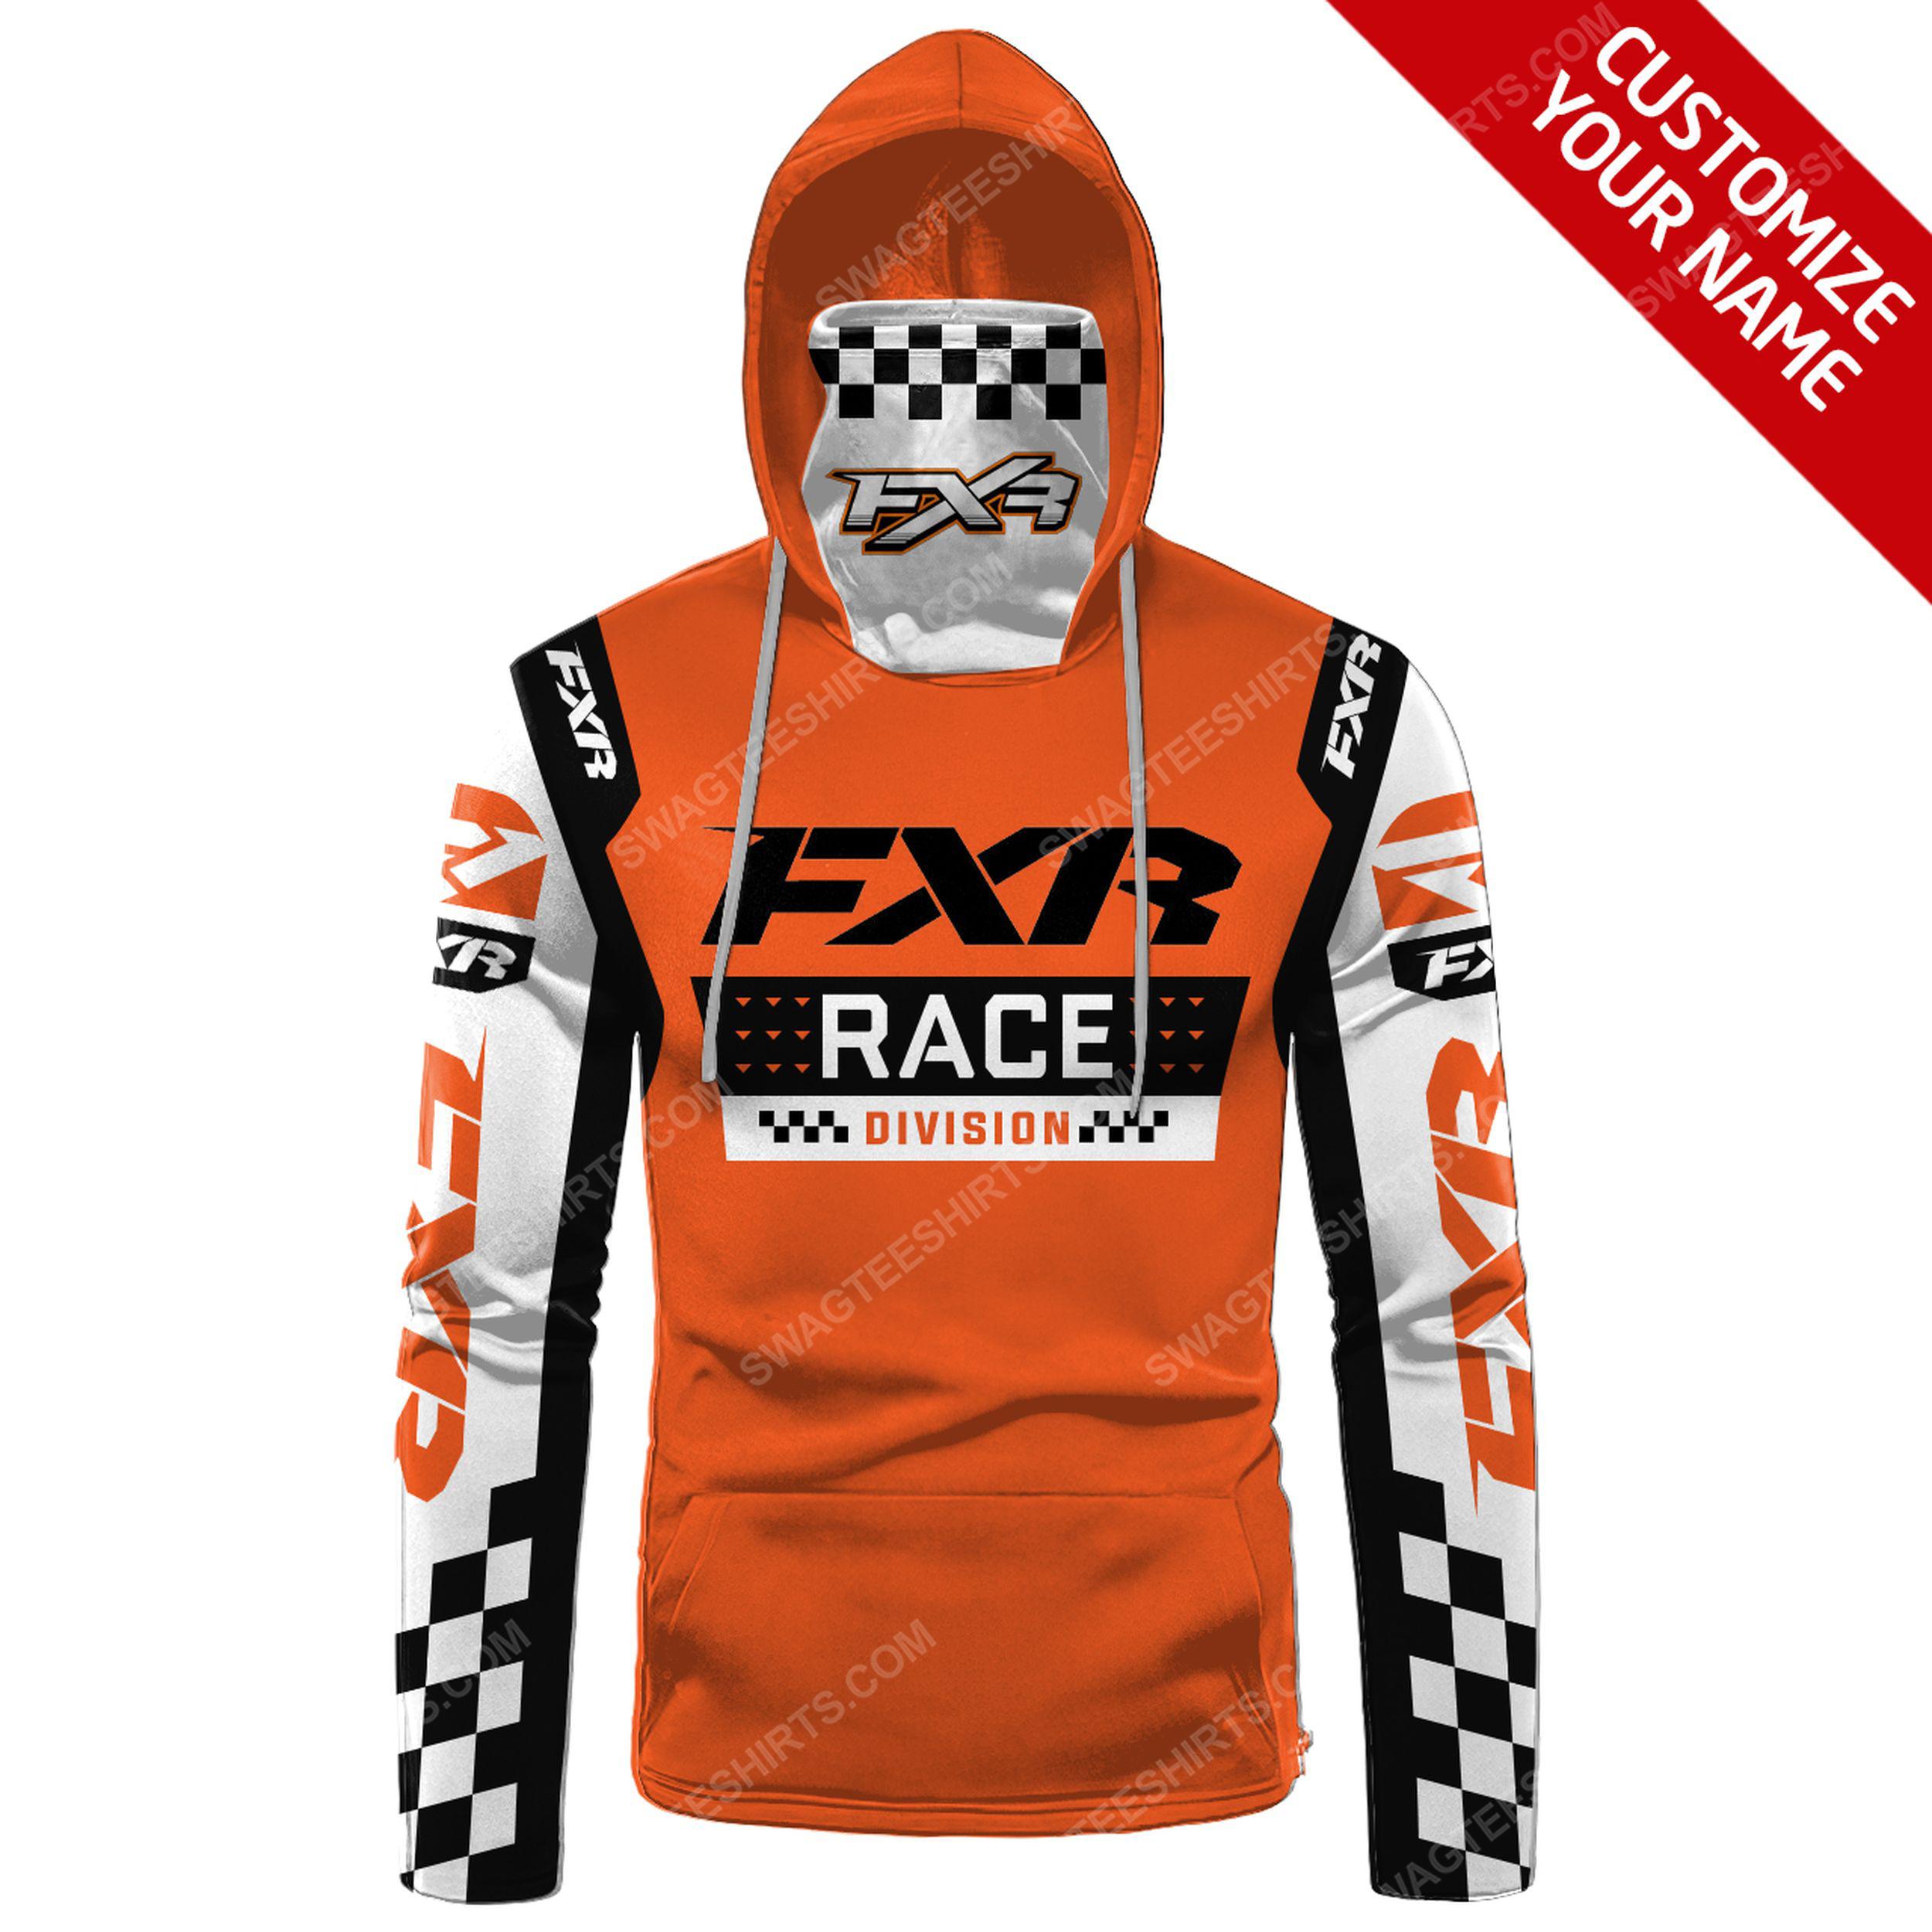 Custom name fxr race division full print mask hoodie 2(1)